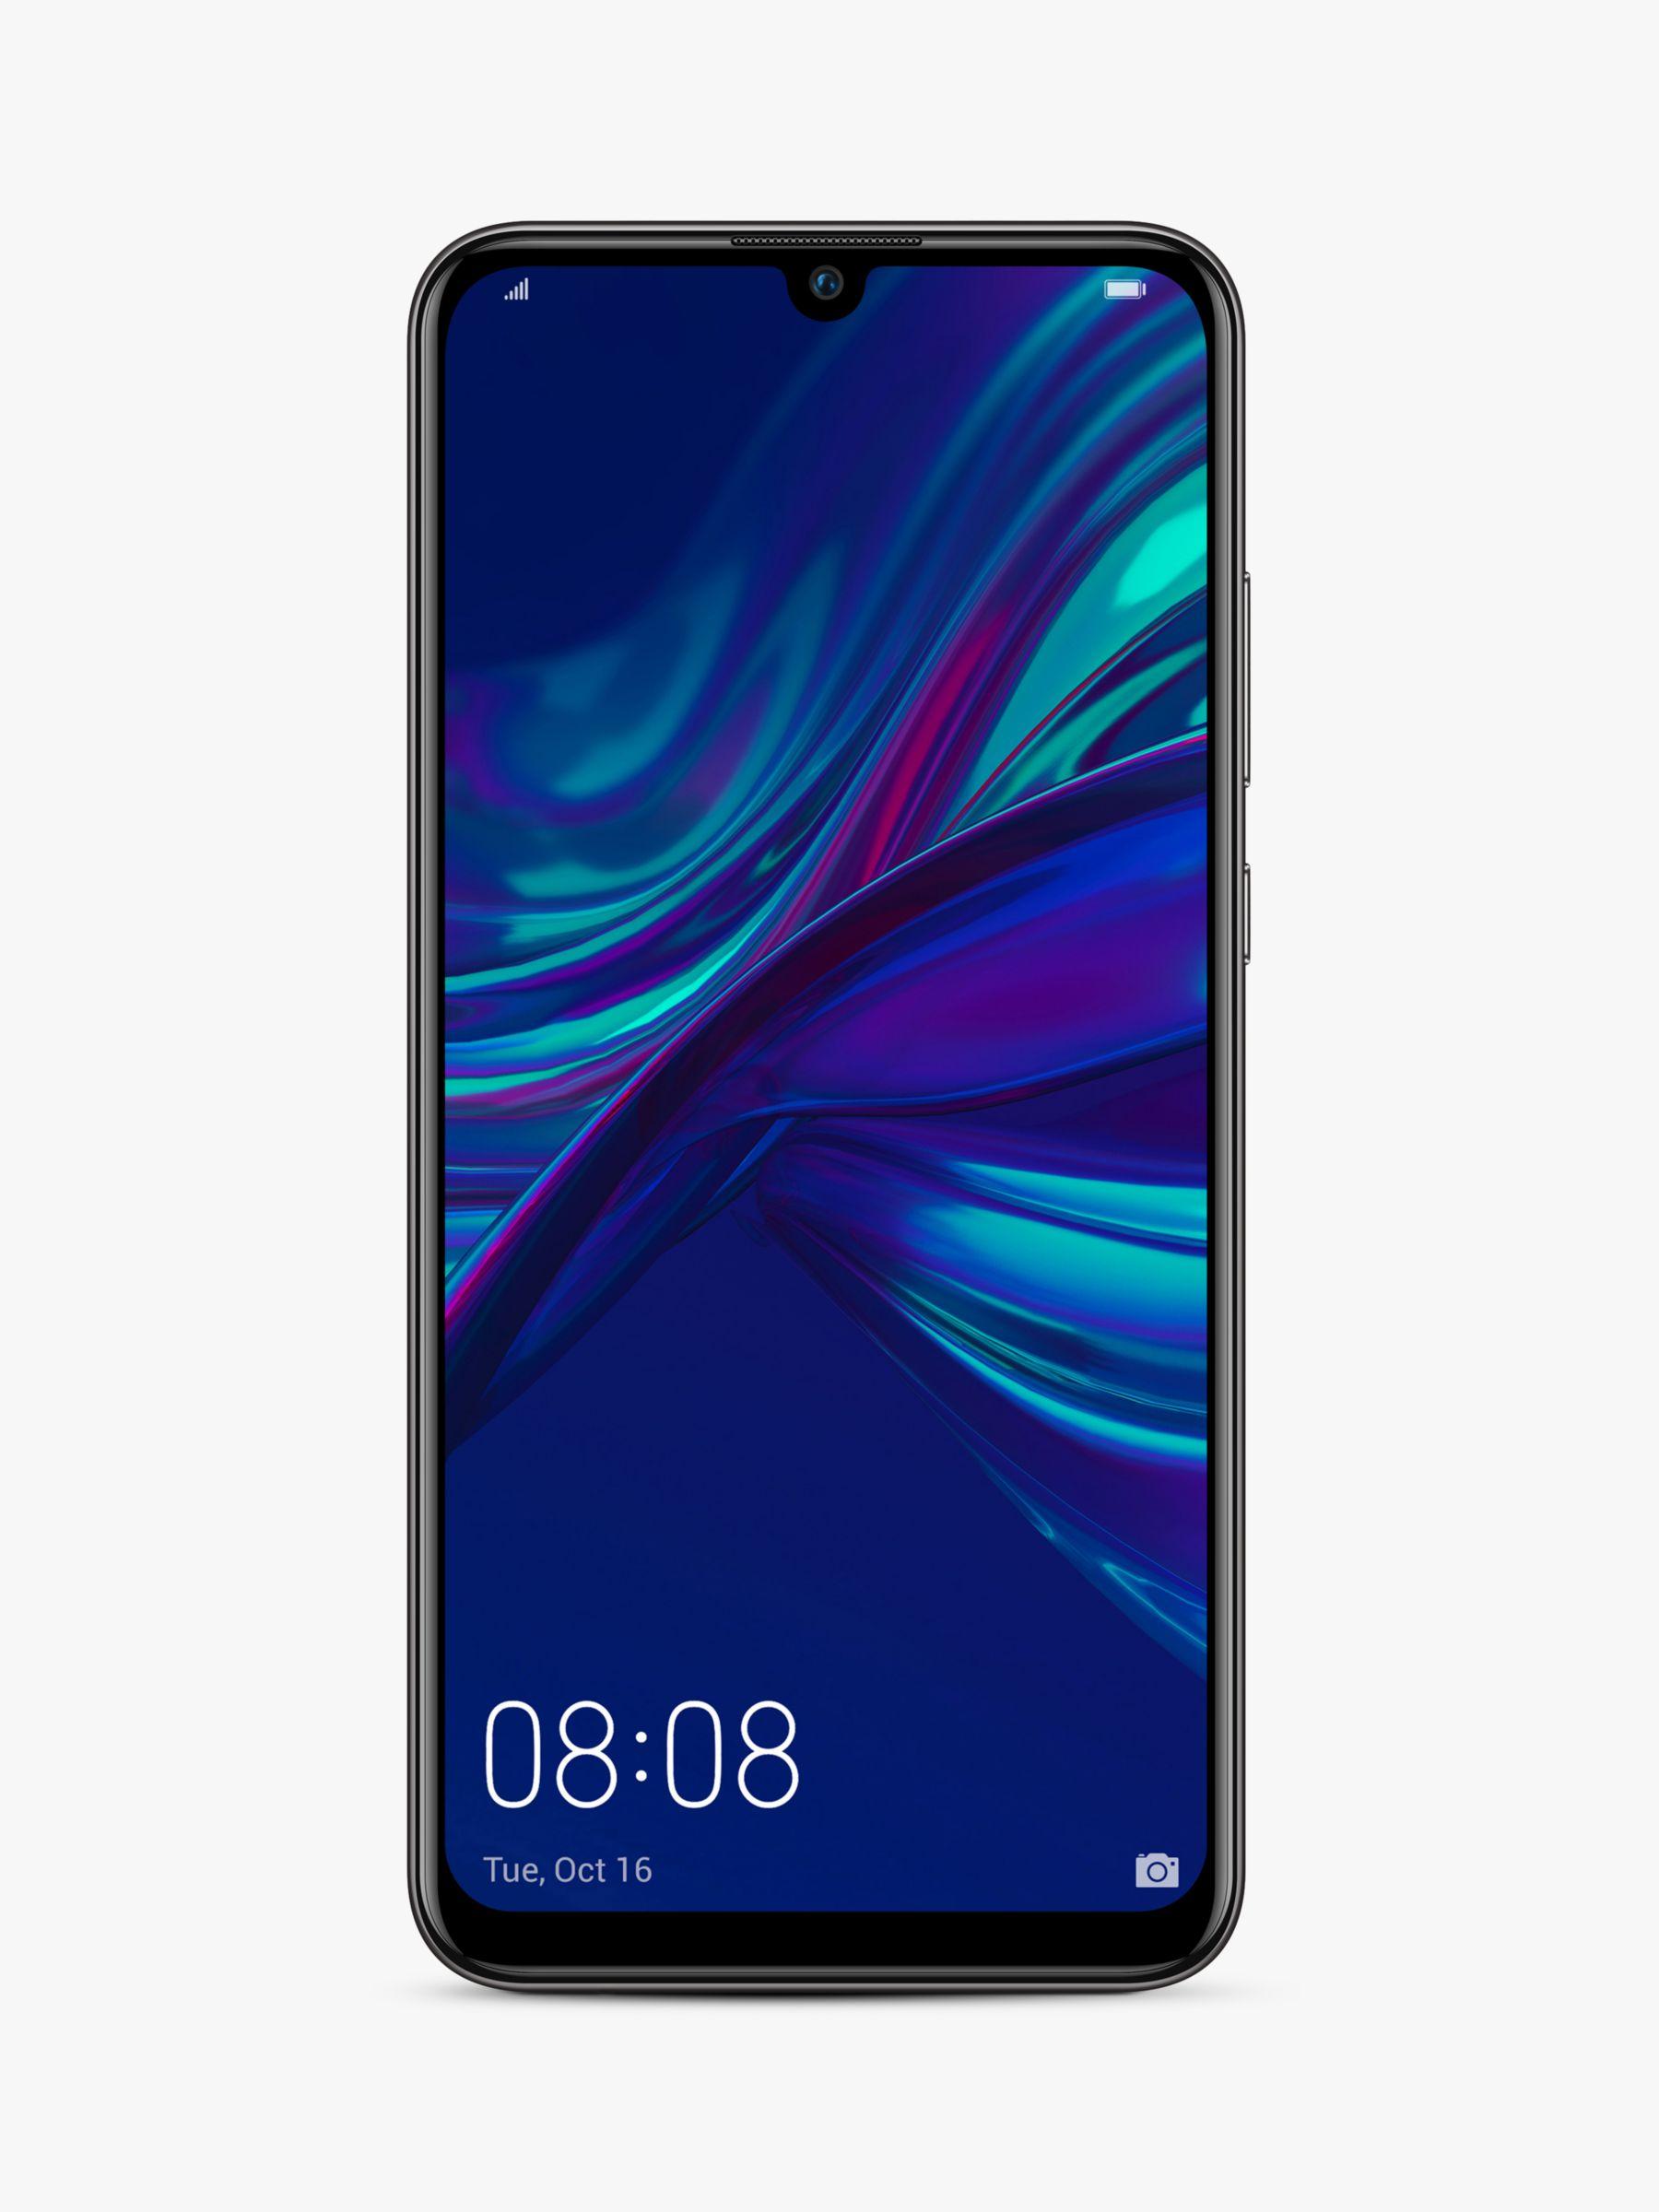 "Huawei Huawei P smart + 2019, Android, 3GB RAM, 6.21"", 4G LTE, SIM Free, 64GB"